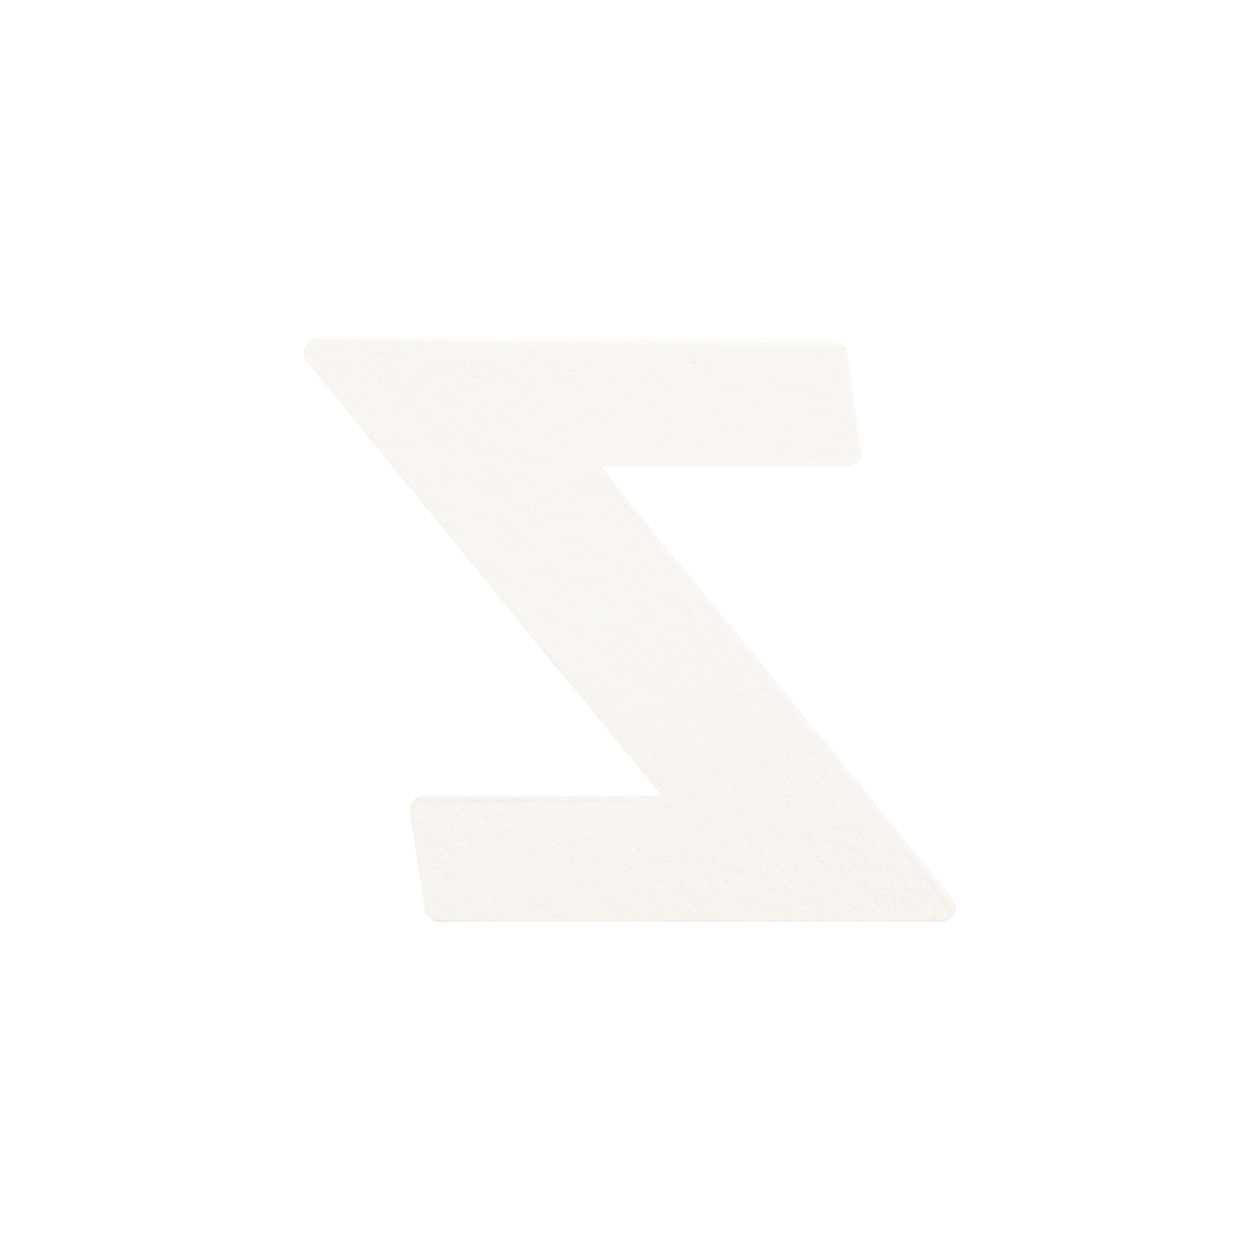 No.395ボード A7カードDC 文字Z シルバー